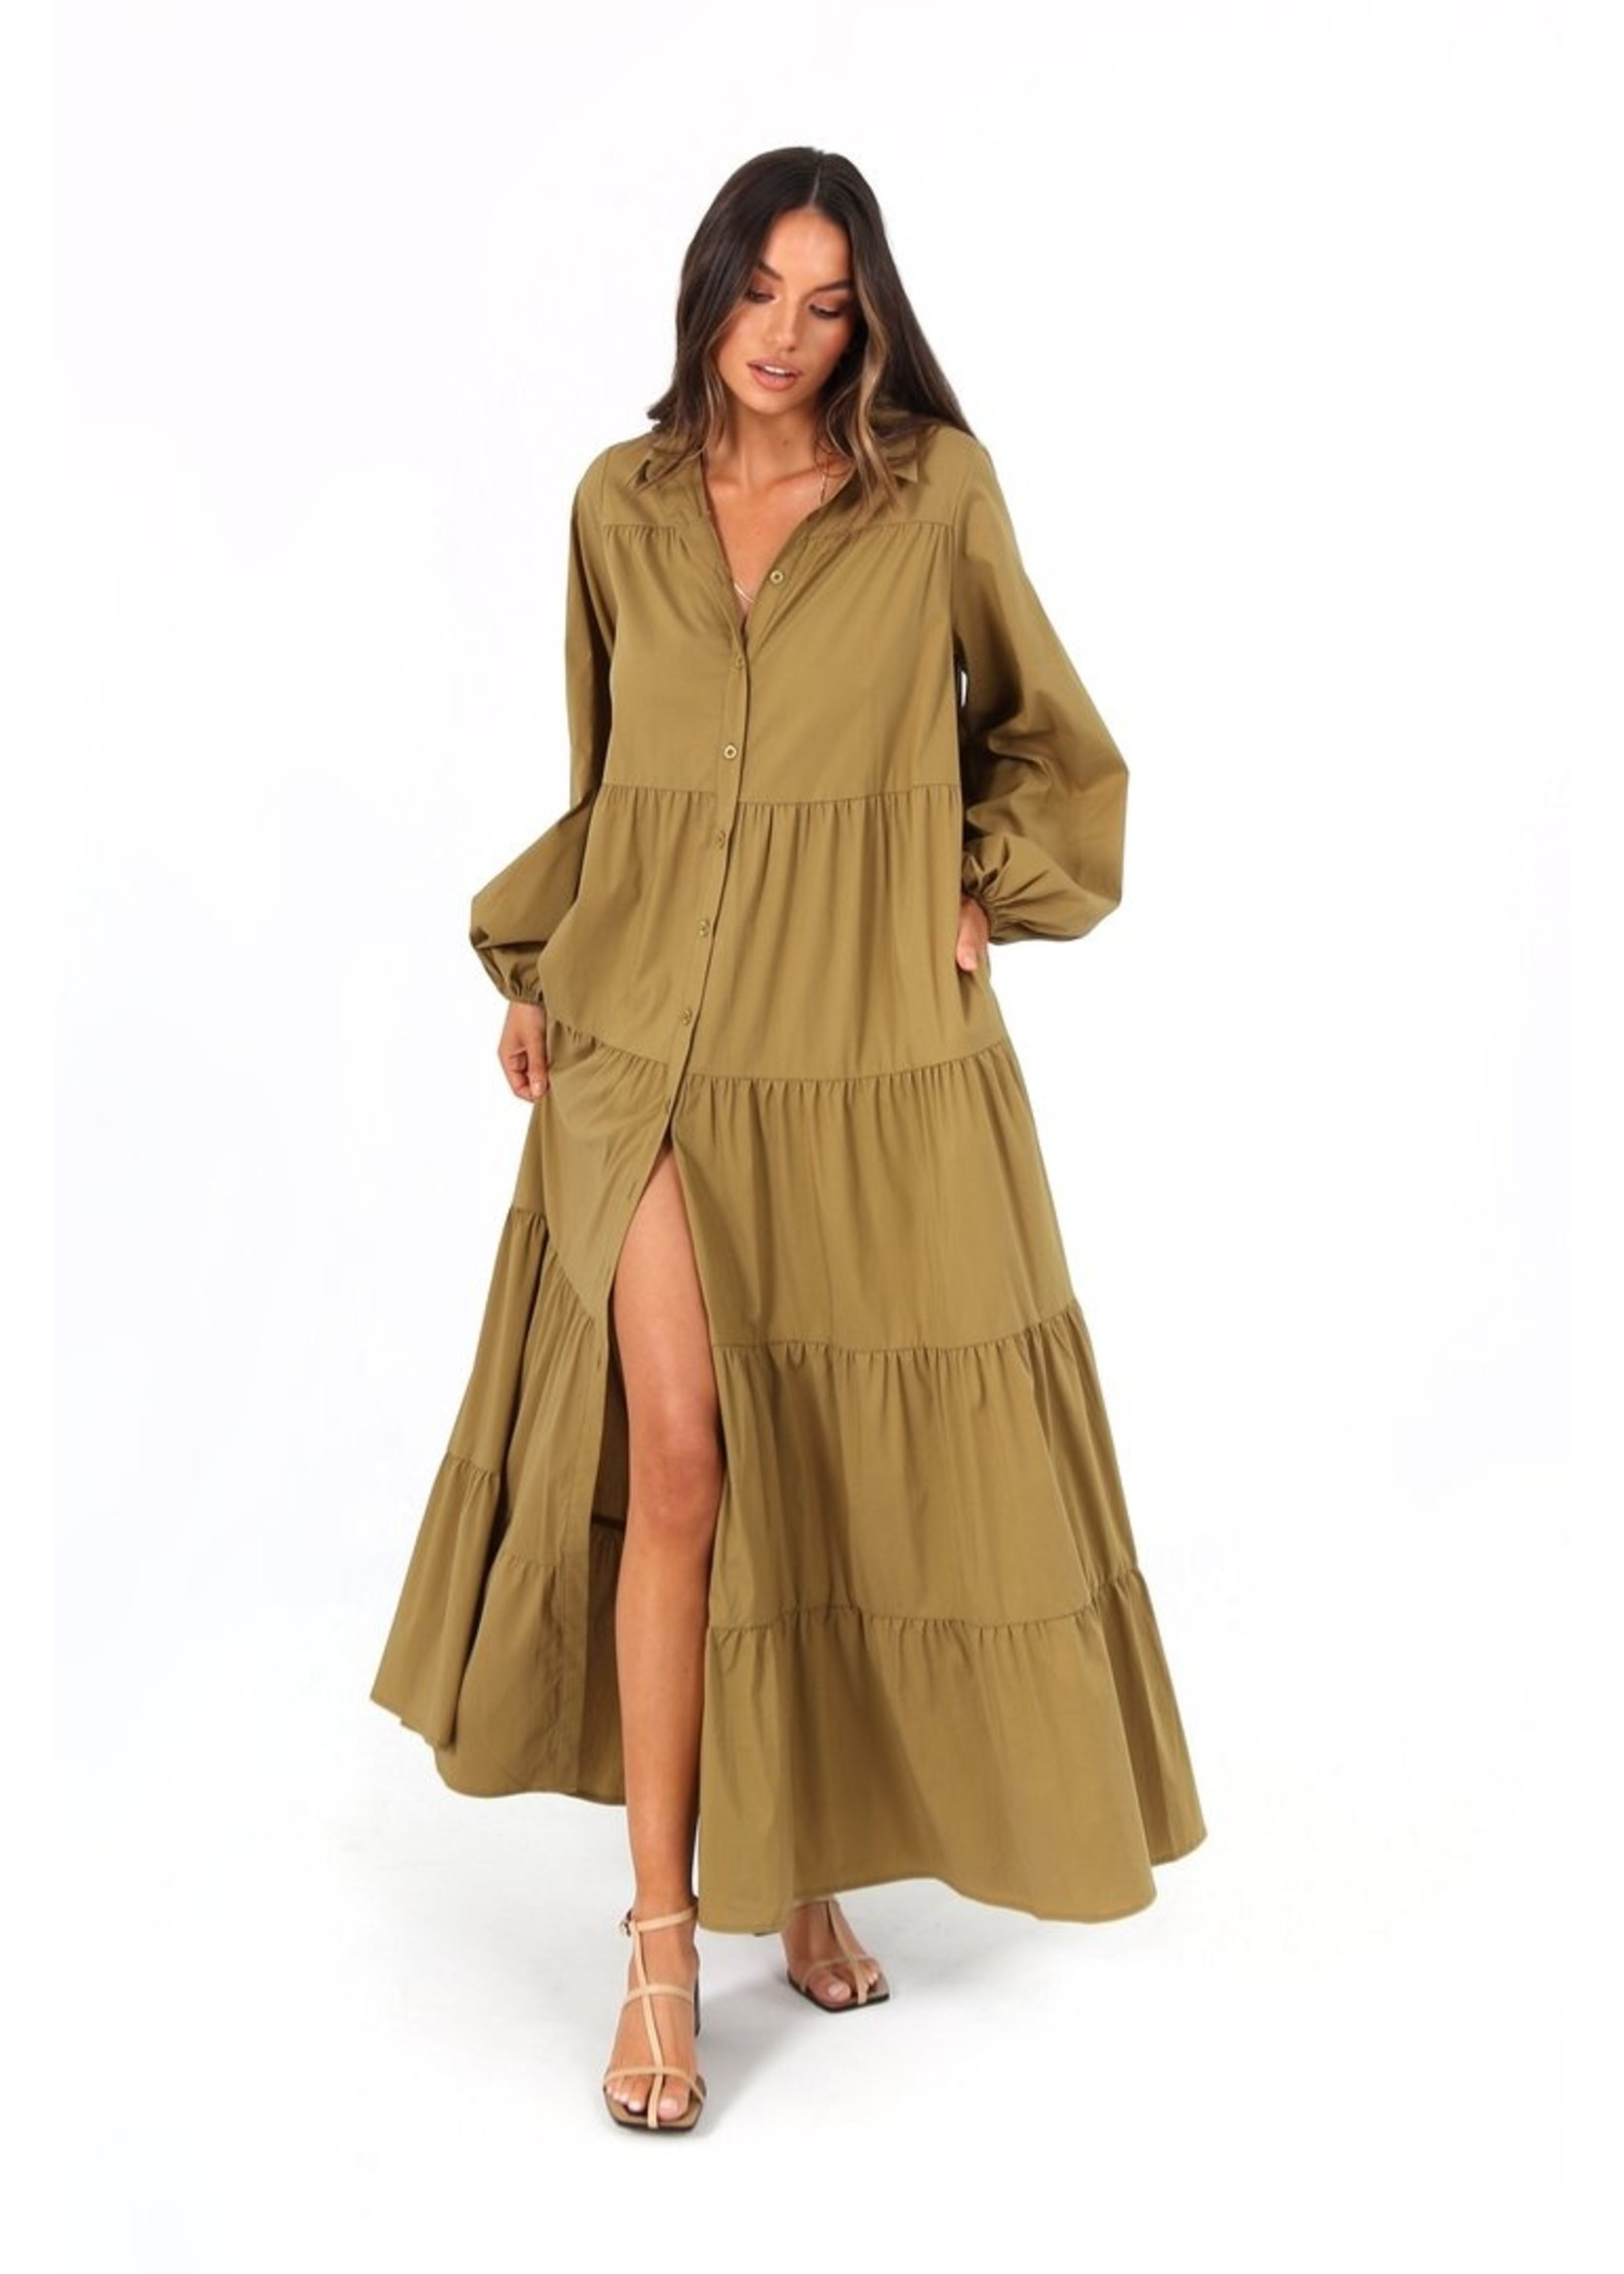 Madison the Label Lexi Maxi Dress